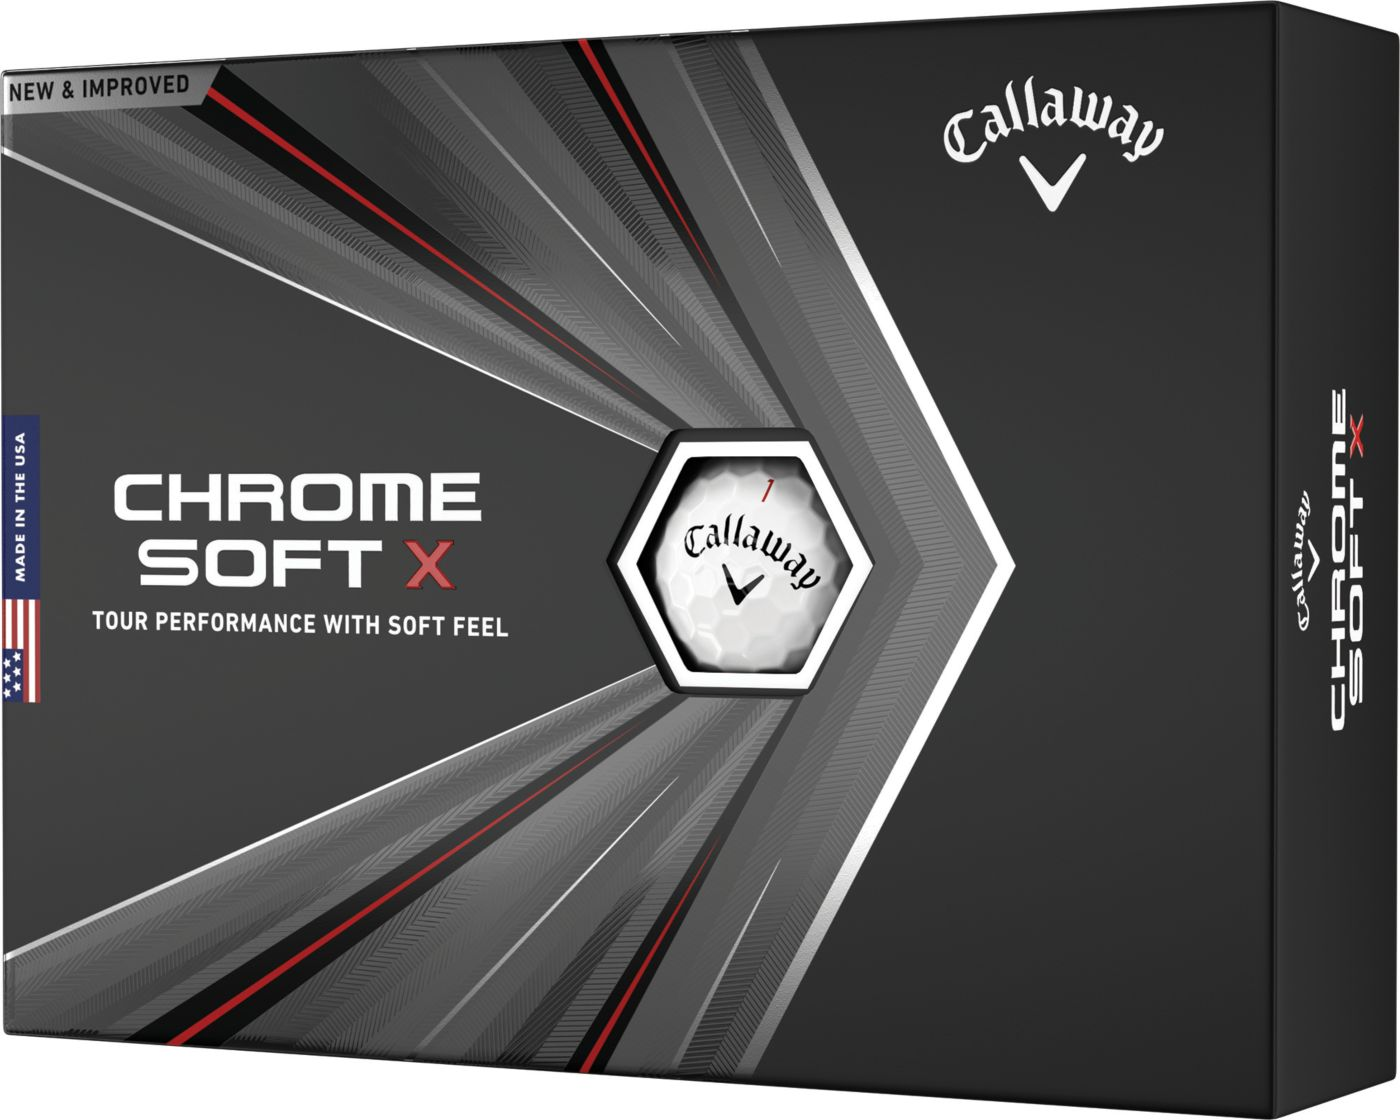 Callaway 2020 Chrome Soft X Golf Balls